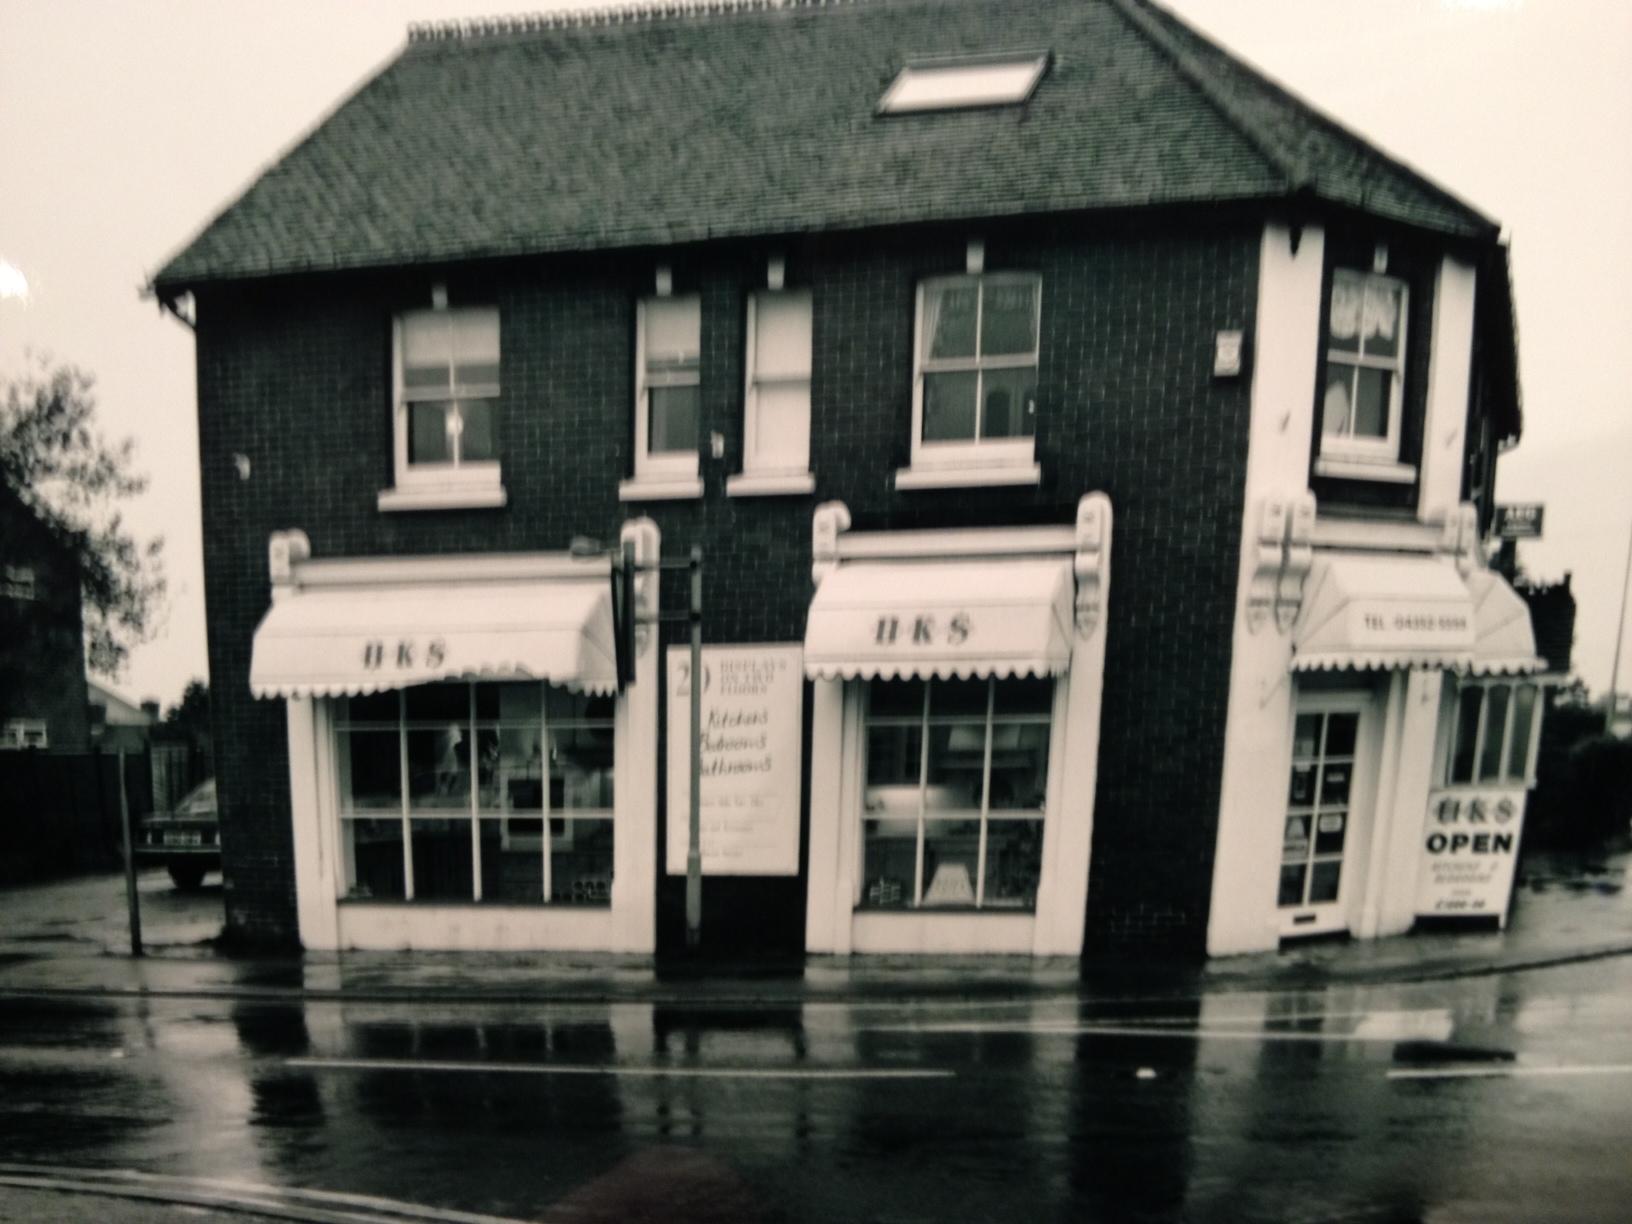 HKS Heathfield 1988